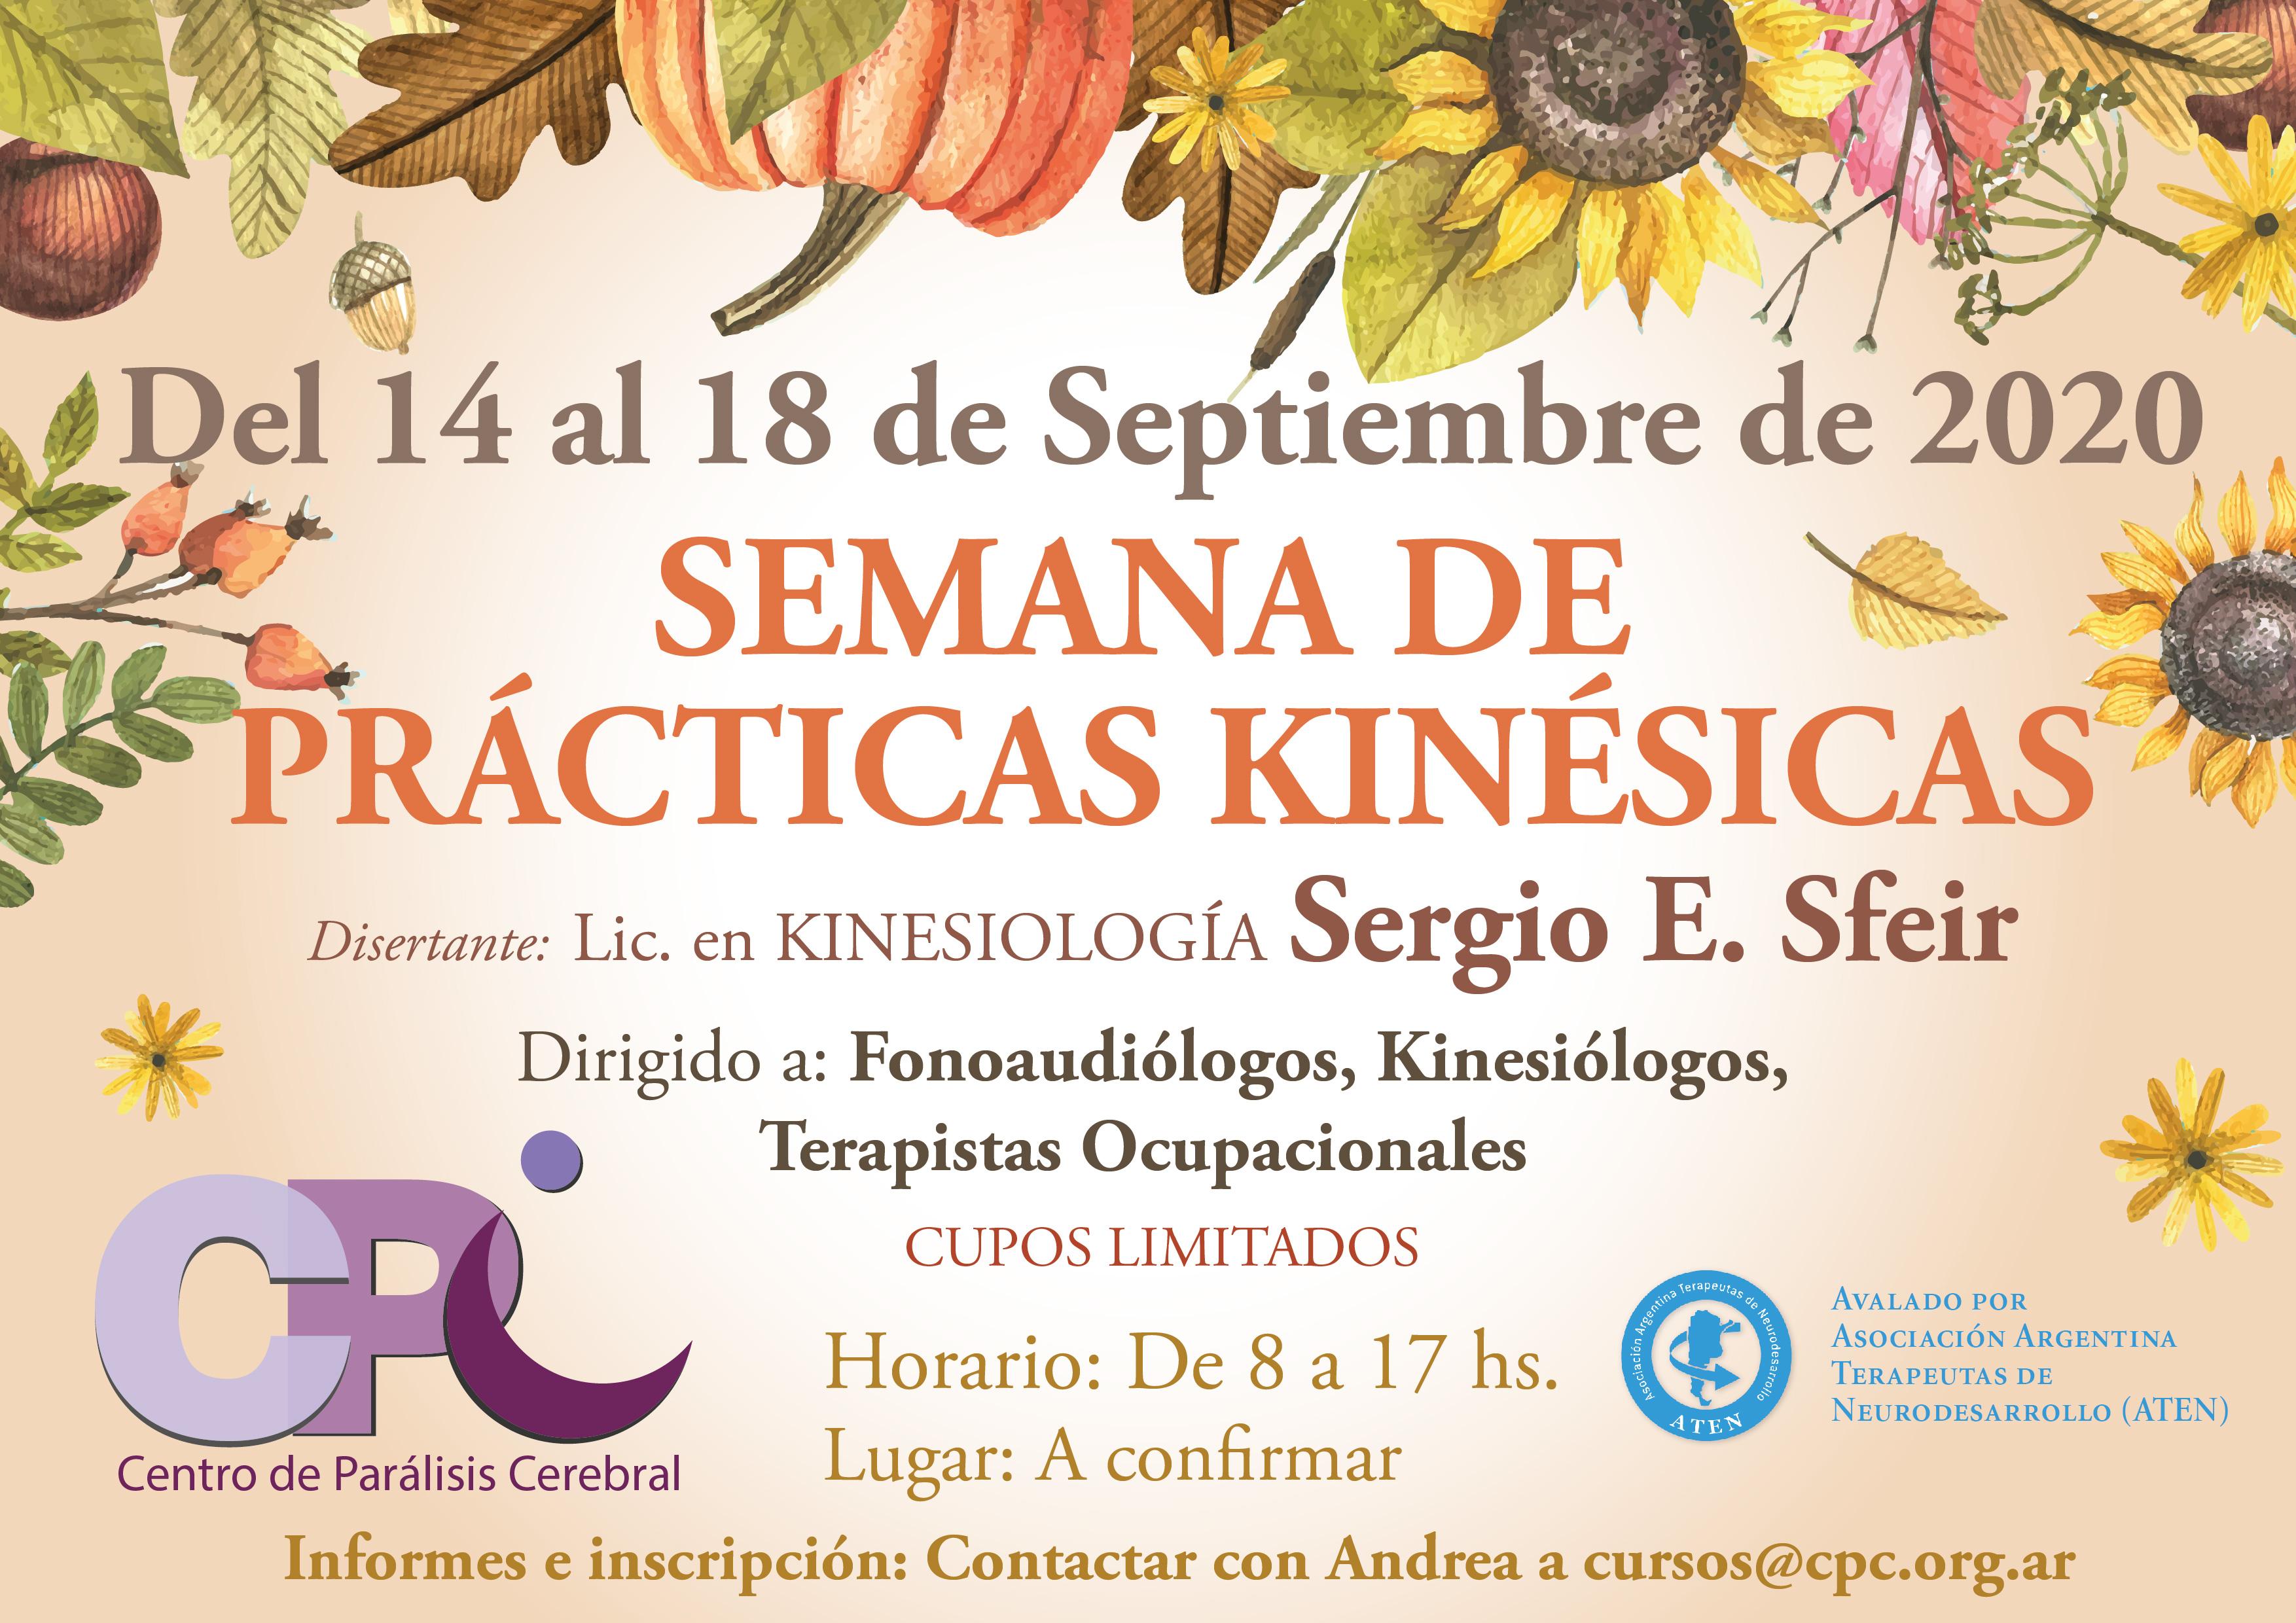 Flyer Semanas de Prácticas Kinésicas en Parálisis Cerebral